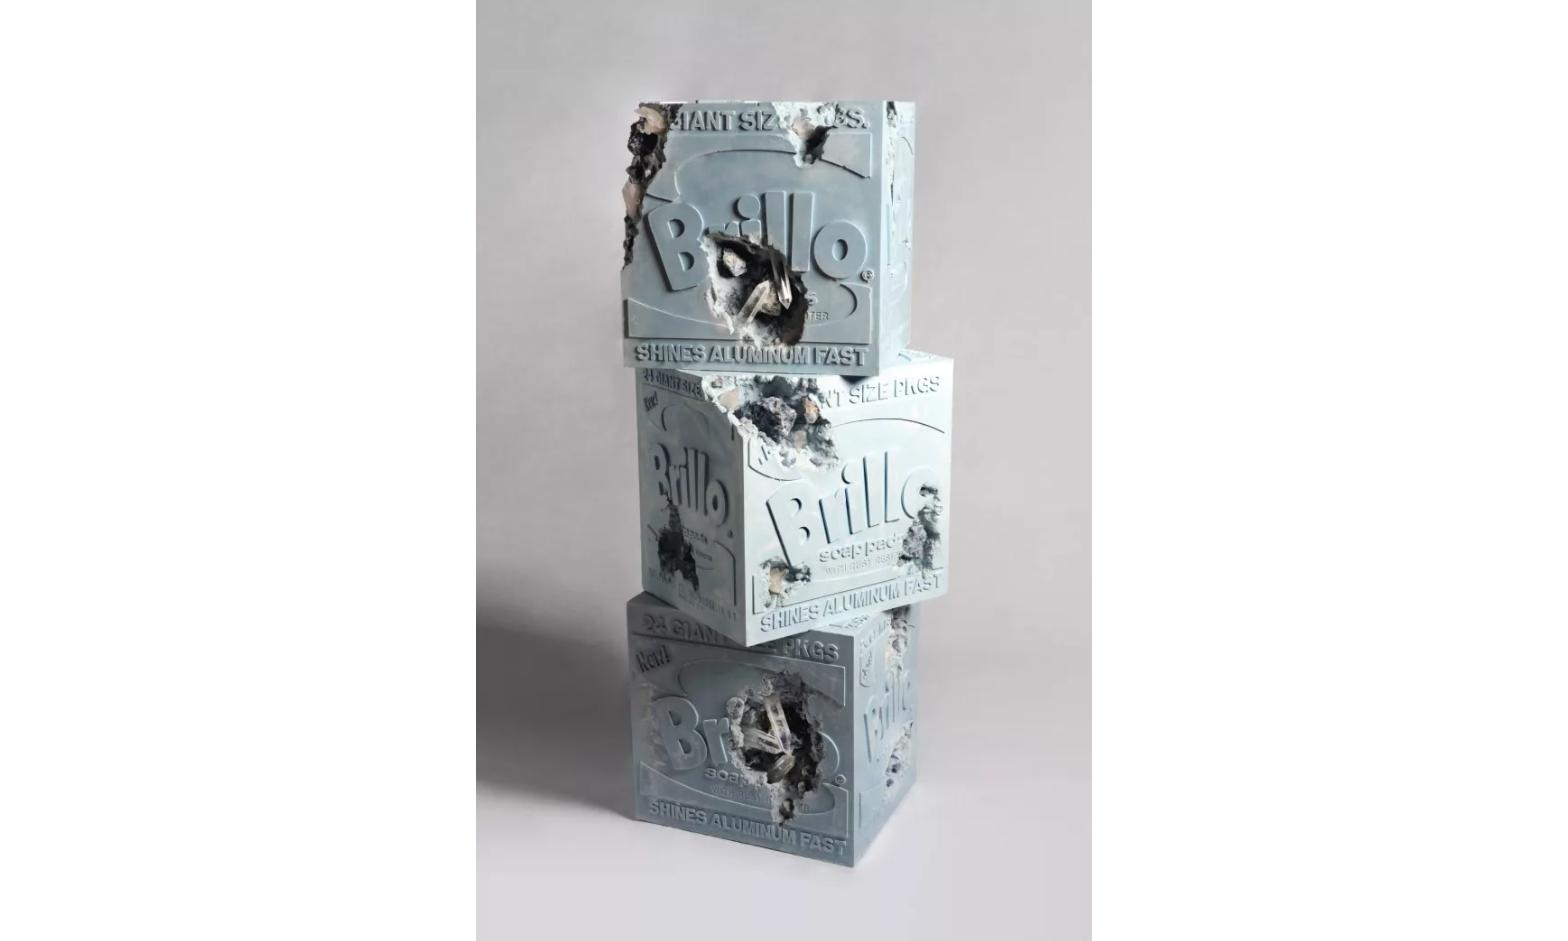 Daniel Arsham 艺术平台 Archive Editions 带来新品发售预告